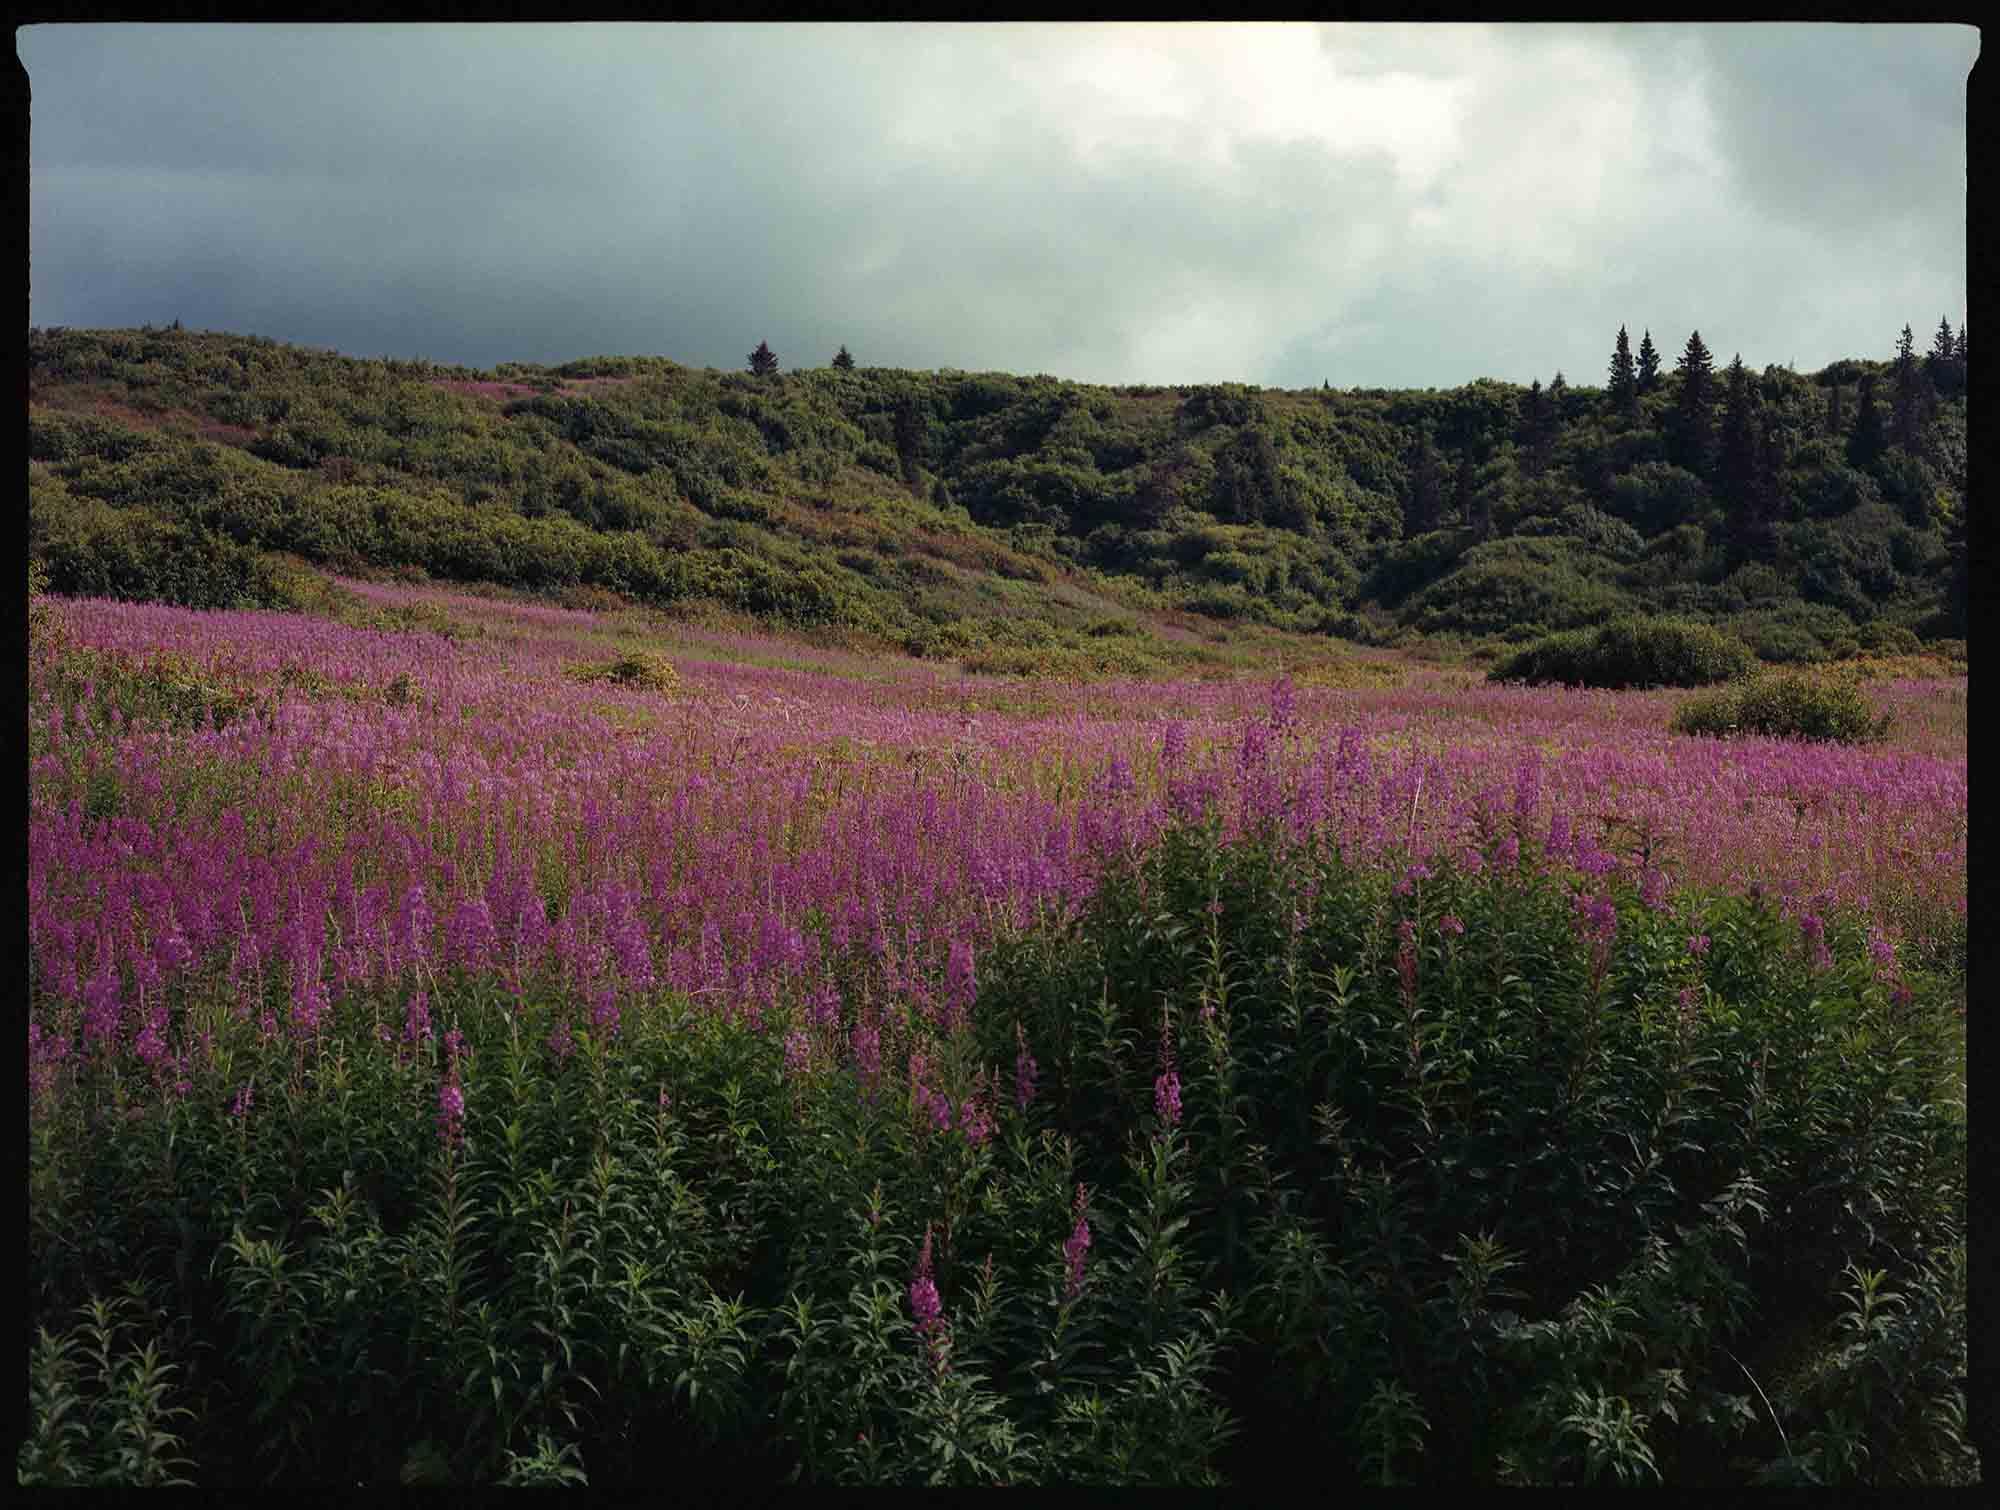 Alaska Roads Wrap Up — Rugile Kaladyte 15